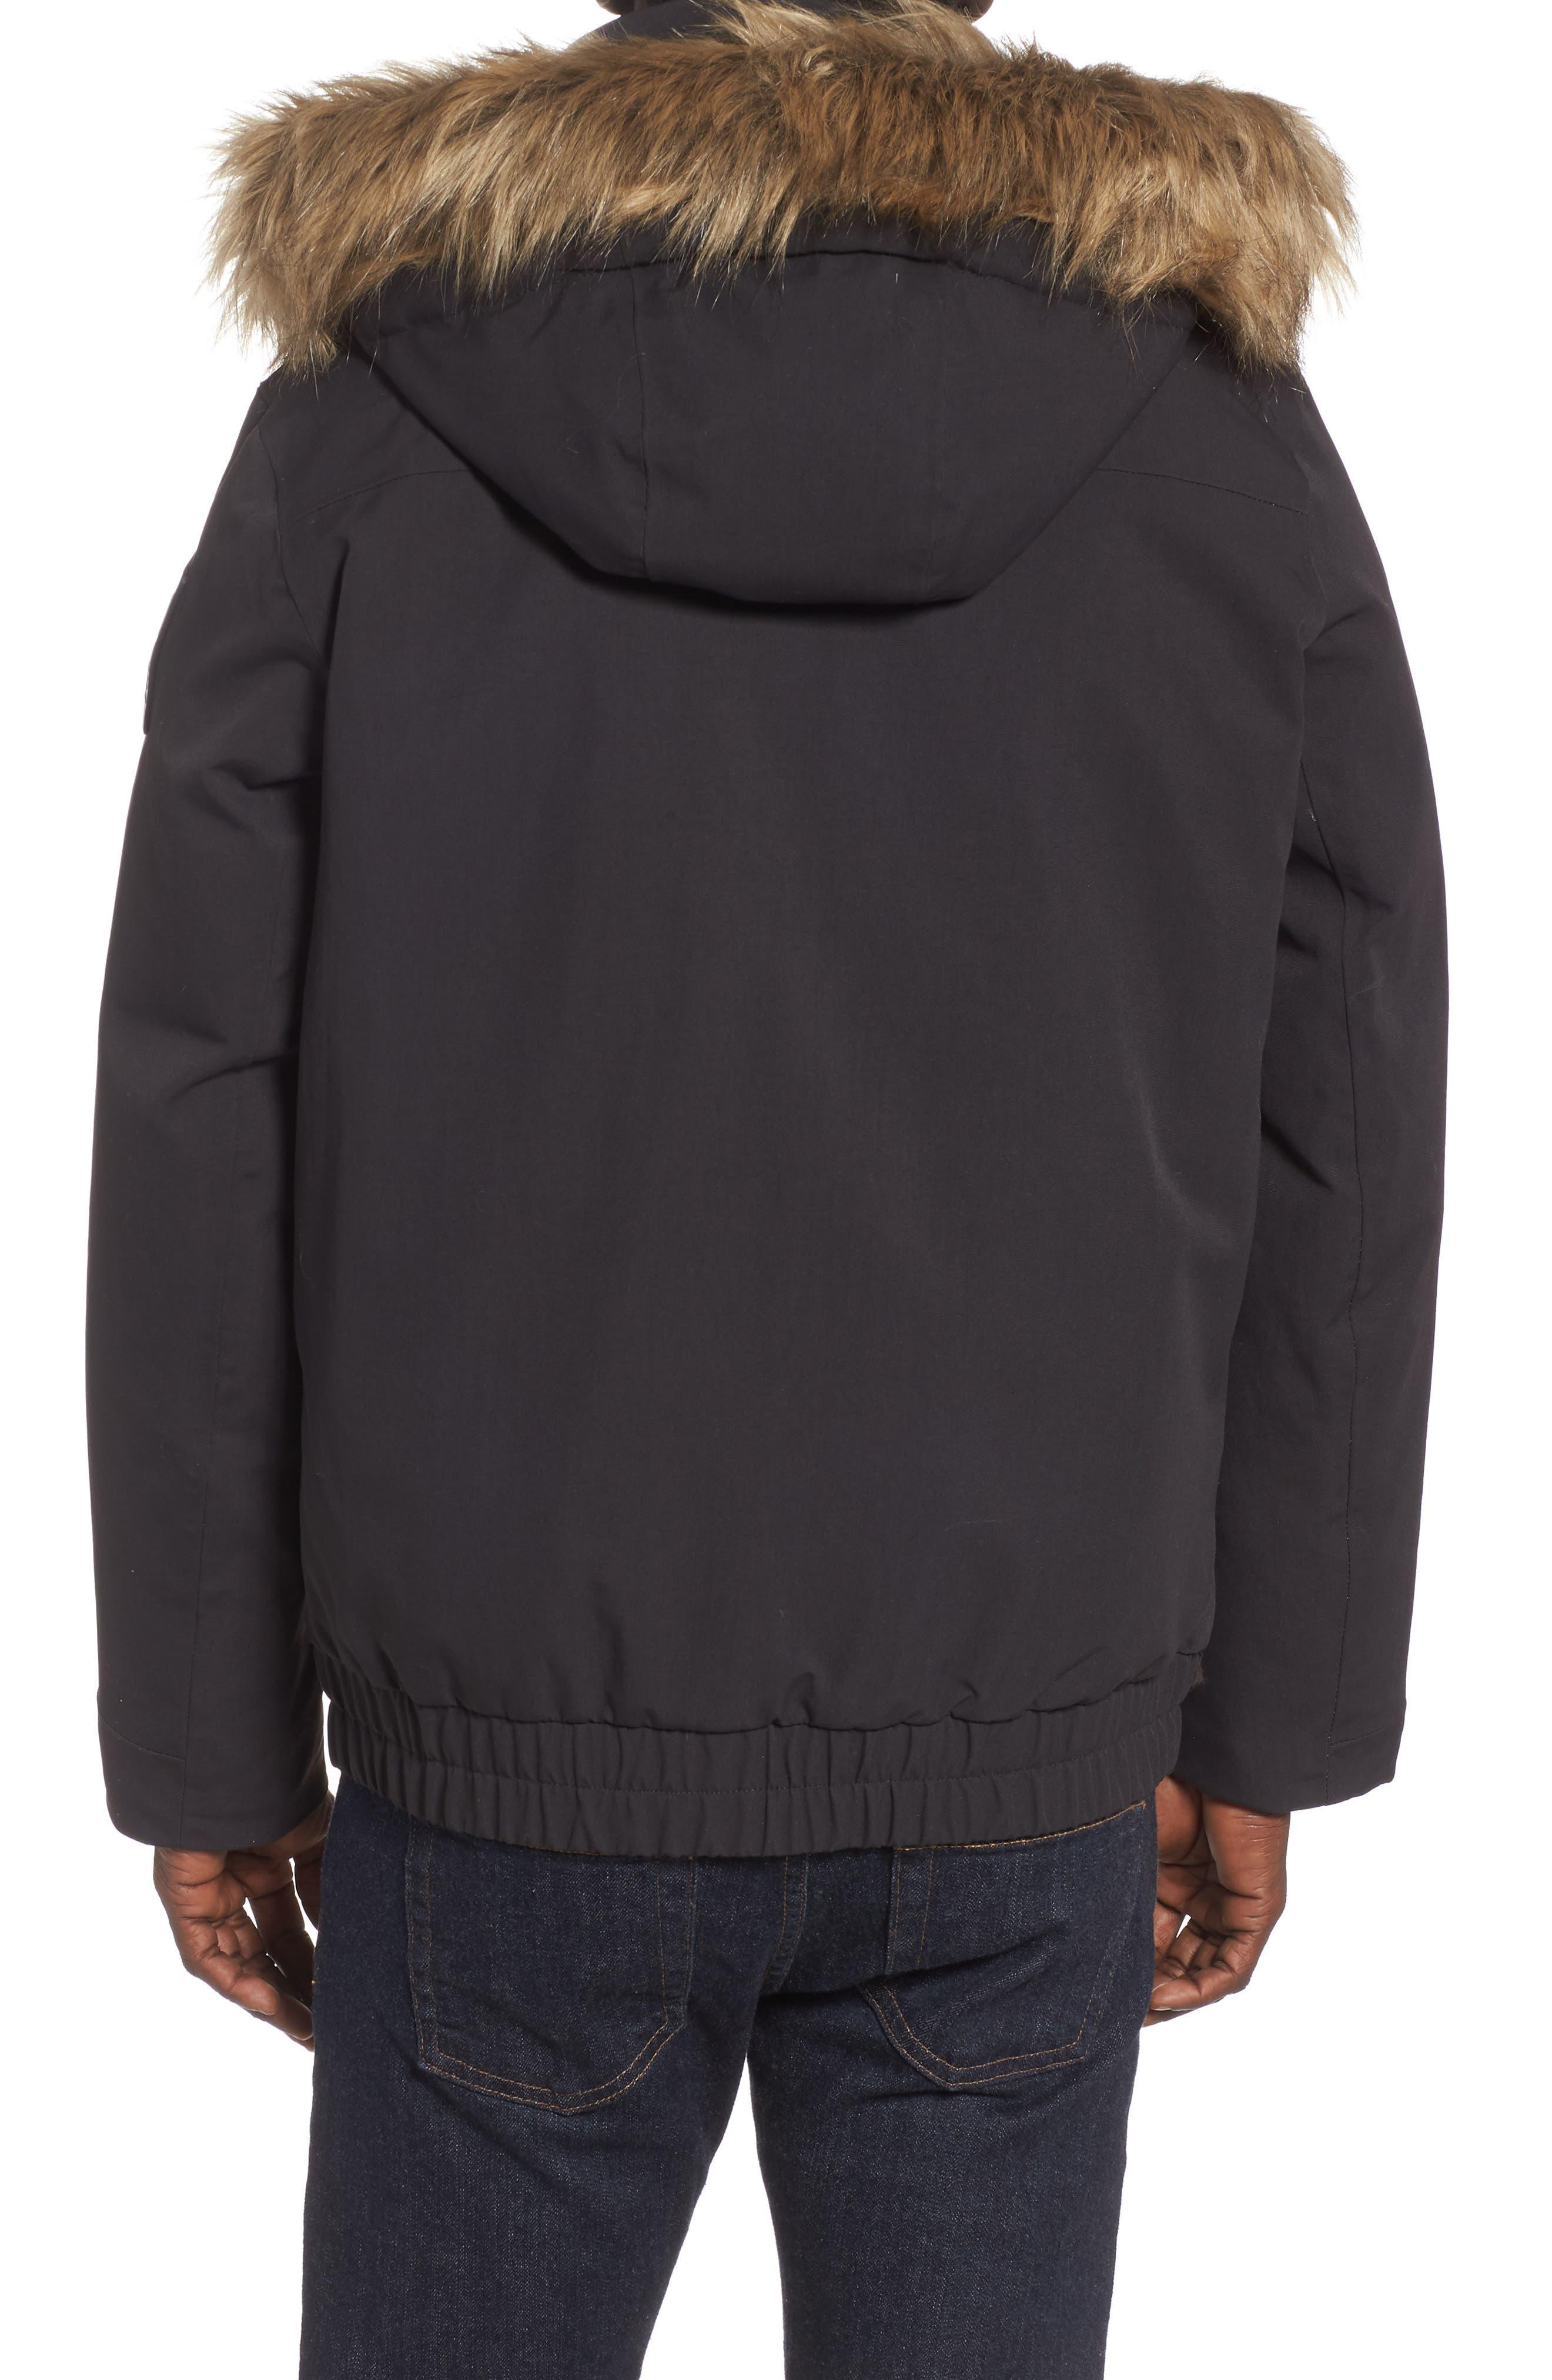 Bardu Waterproof Bomber Jacket with Detachable Hood and Faux Fur Trim,                             Alternate thumbnail 2, color,                             BLACK